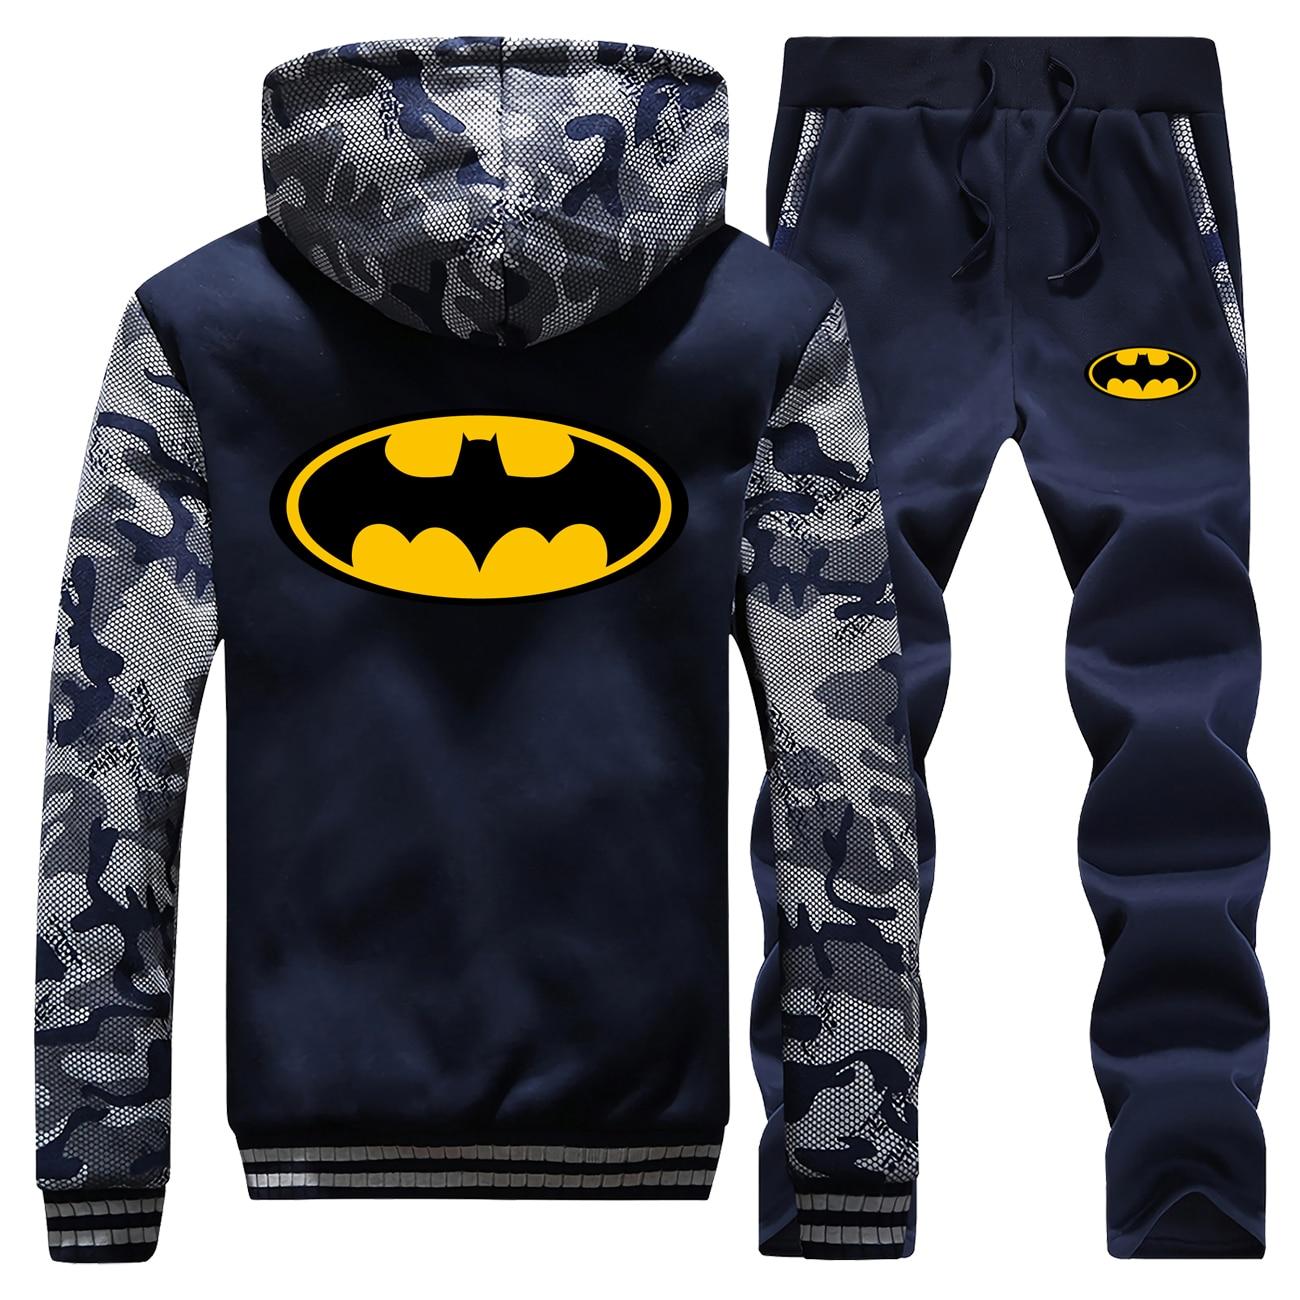 Bat Man Super Hero Fashion Camo Pants Sweatshirt Casual Military Jackets Fleece Zipper Camoflage Mens Batman Full Suit Tracksuit